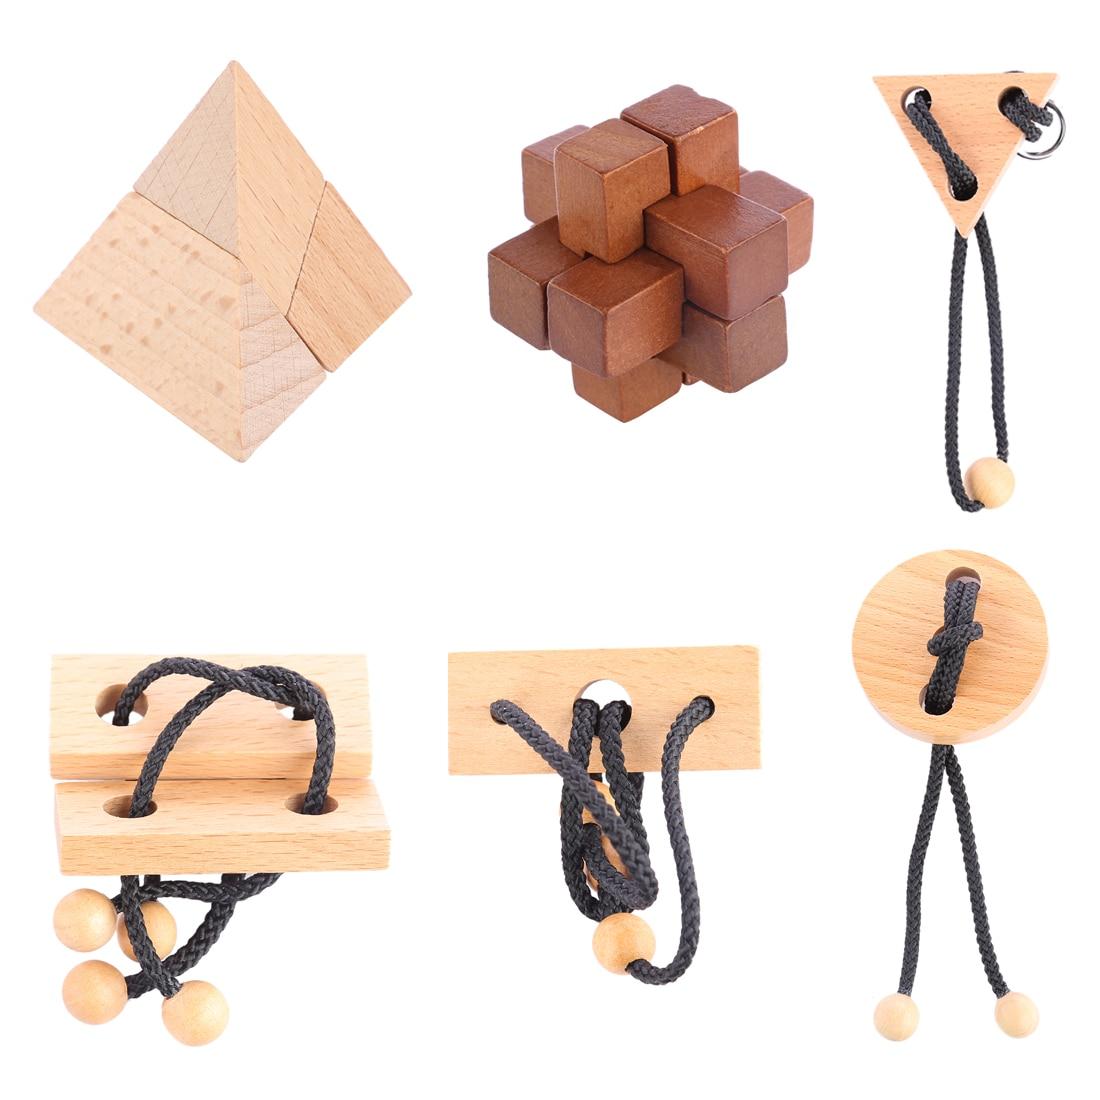 UTOYSLAND 6pcs/set Puzzle Toy Wooden Kong Ming Lock Rope Puzzle Set Brain Teaser Children Development Educational Toy